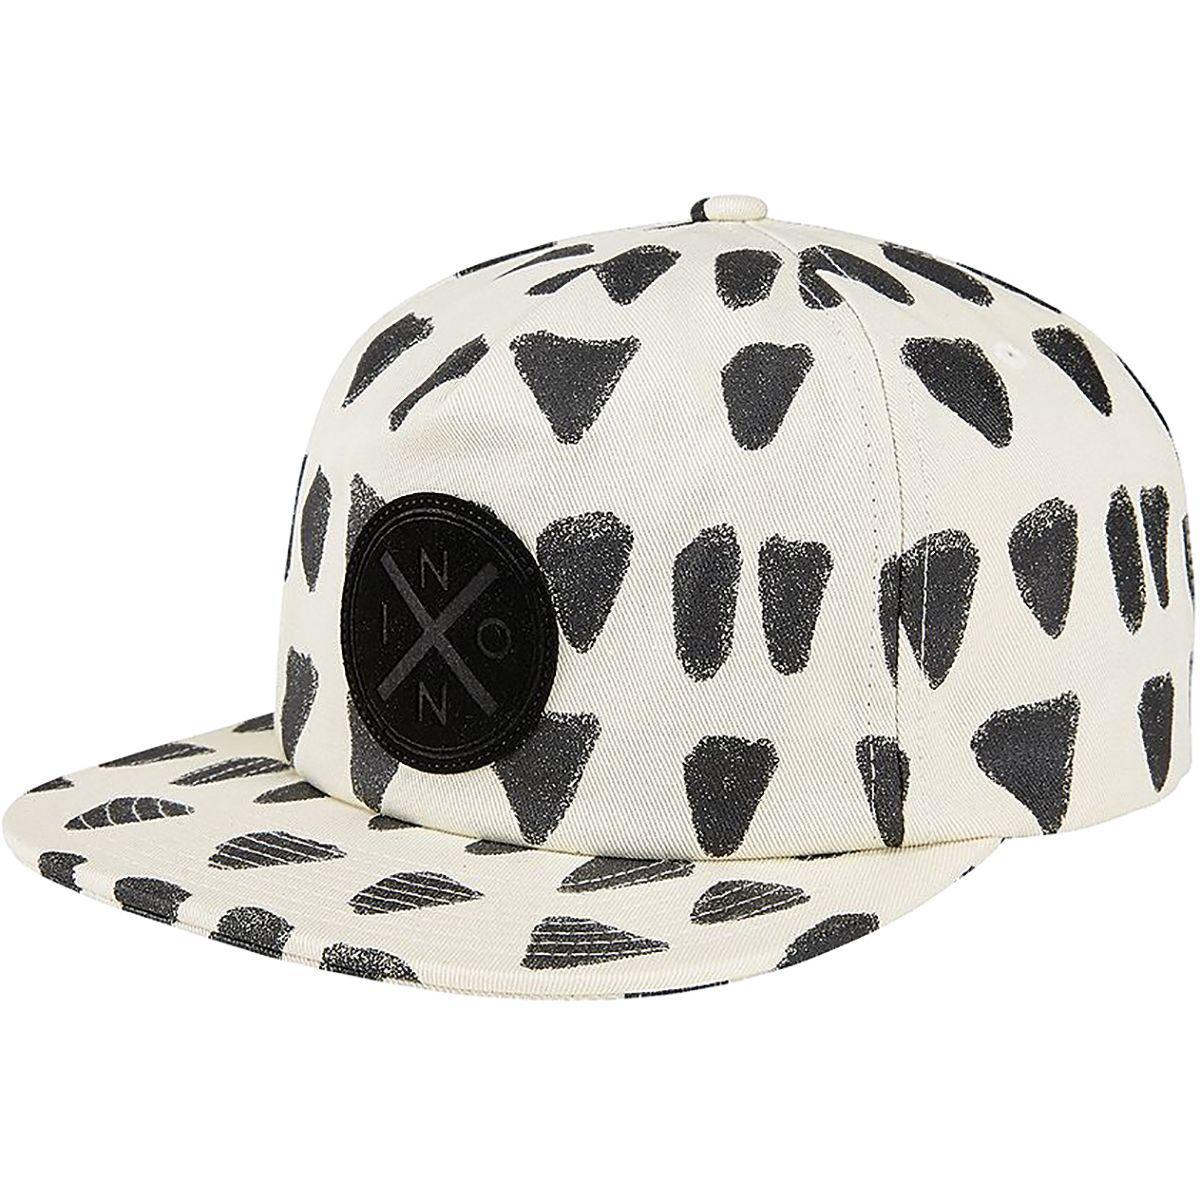 Lyst - Nixon Beachside Snap Back Hat in Black for Men 3727b6581f60